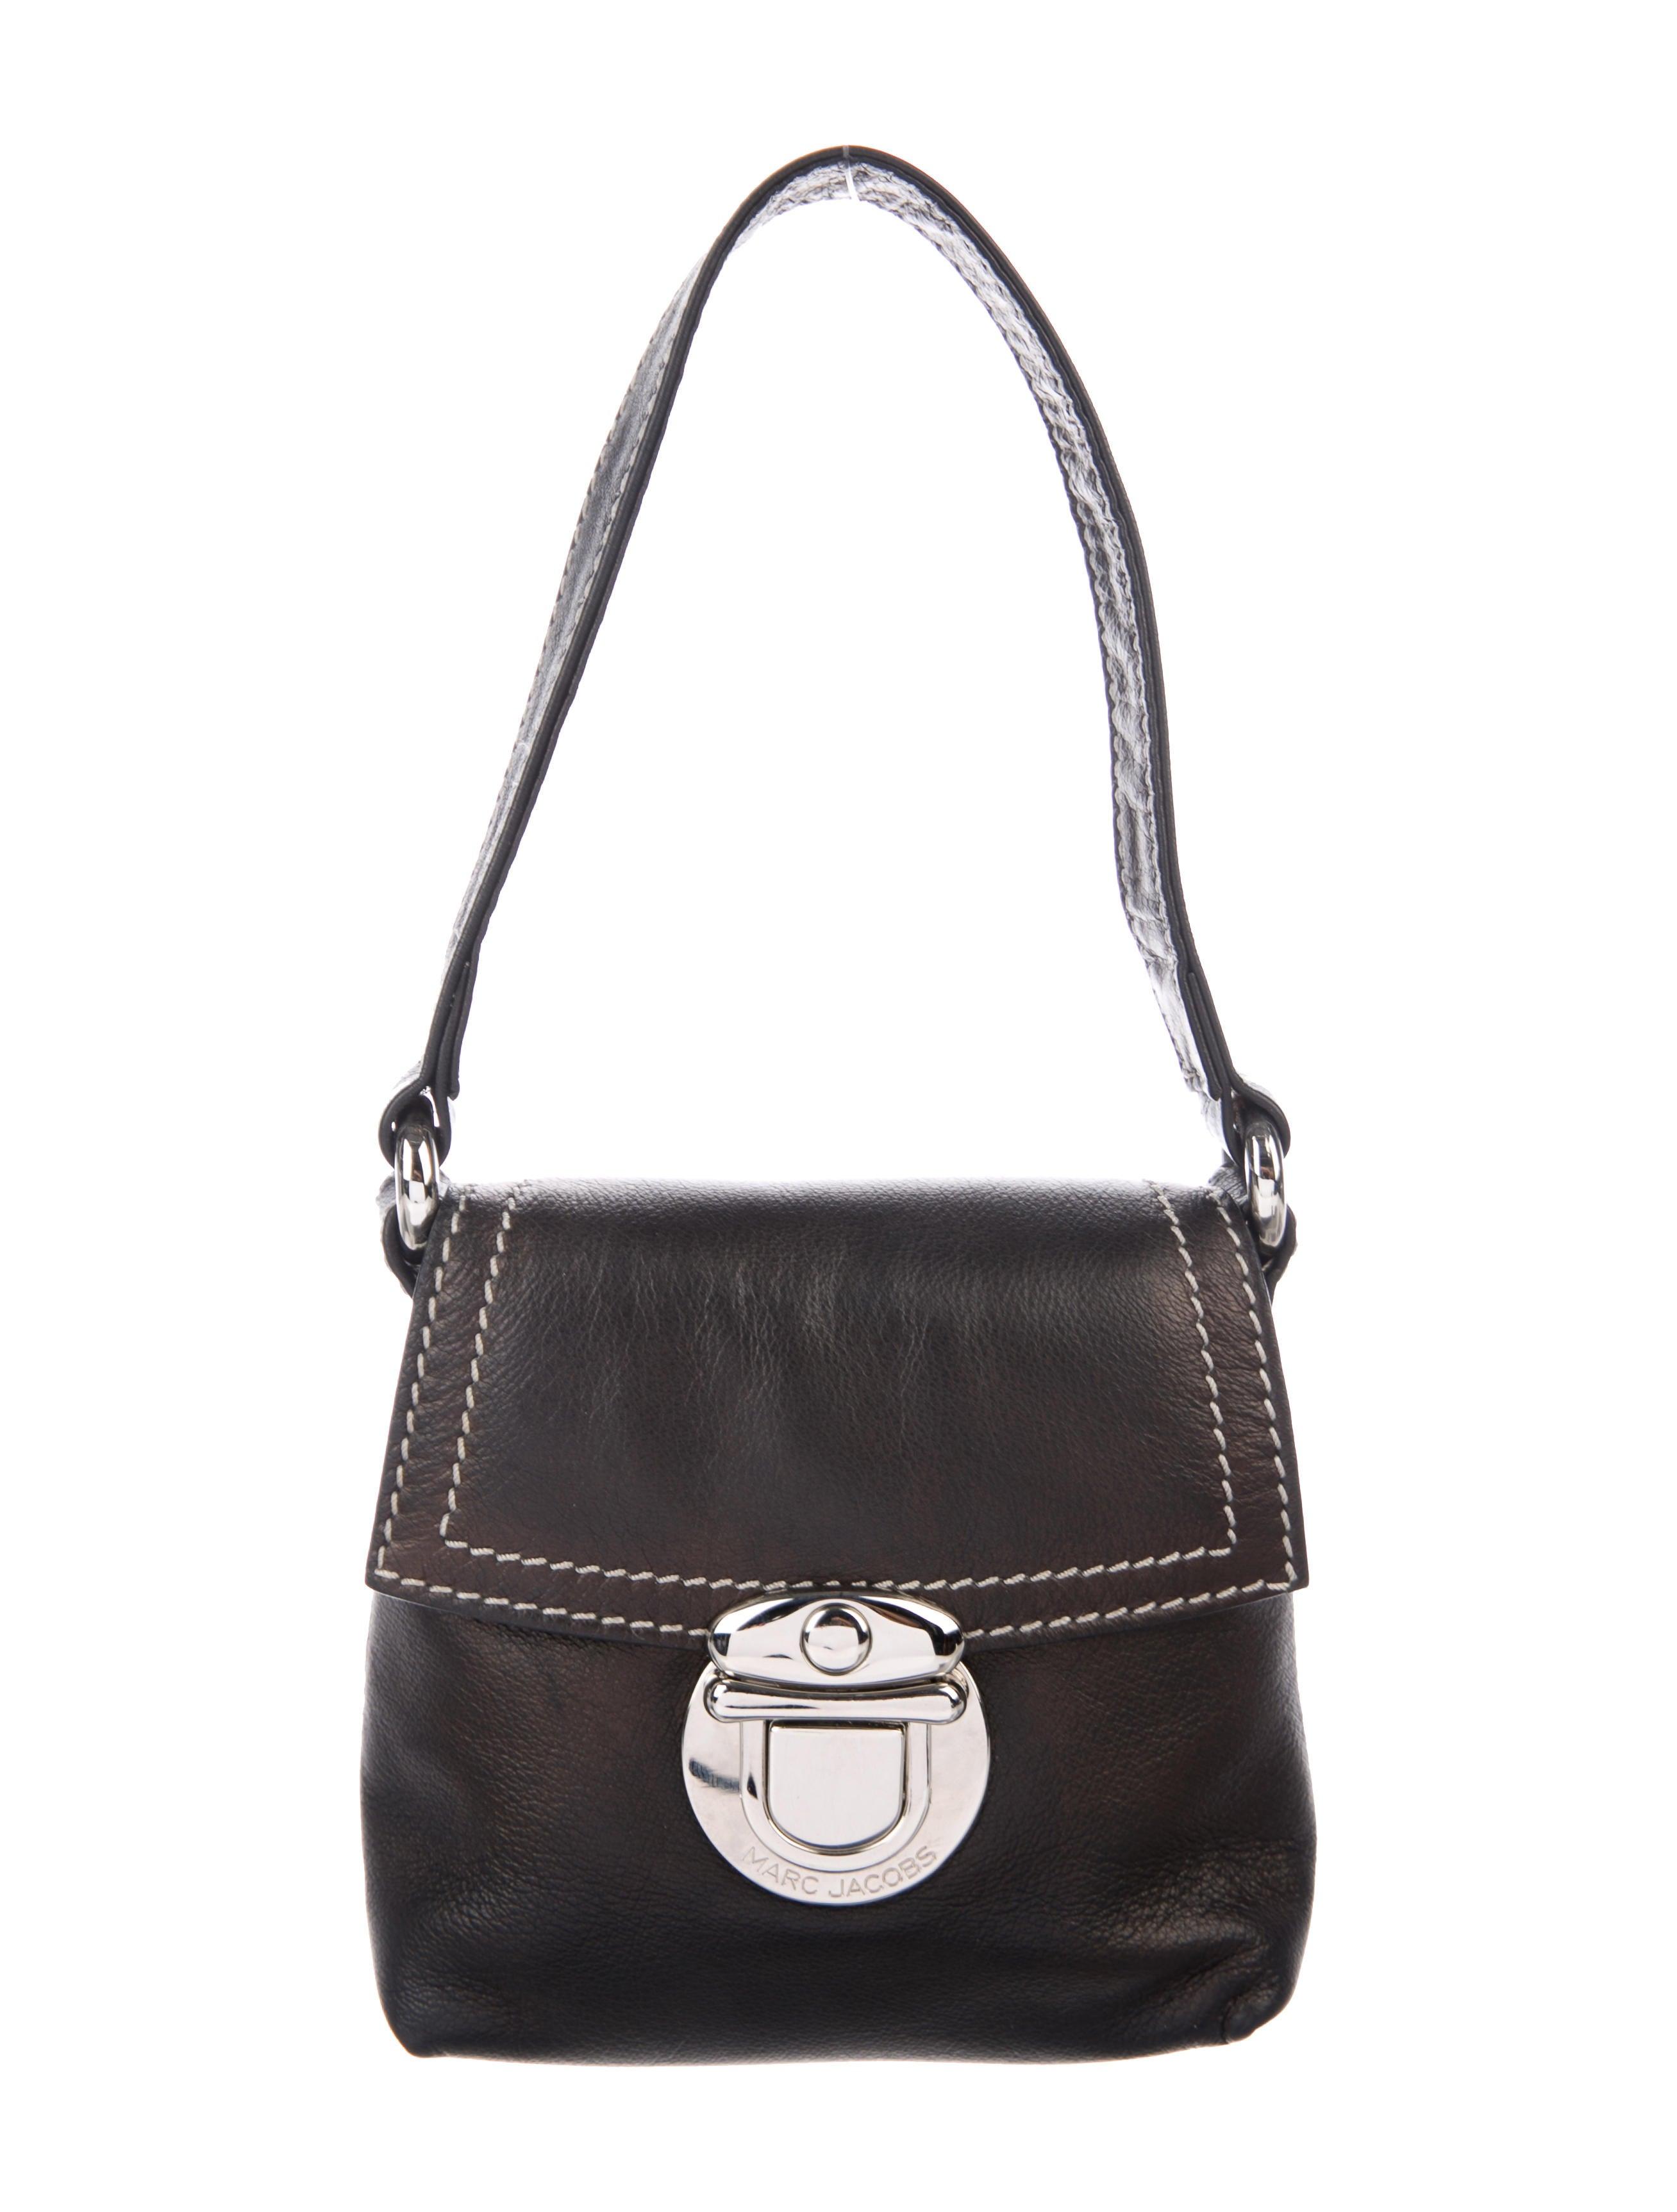 Marc Jacobs Mini Leather Pochette - Handbags - MAR73201 | The RealReal